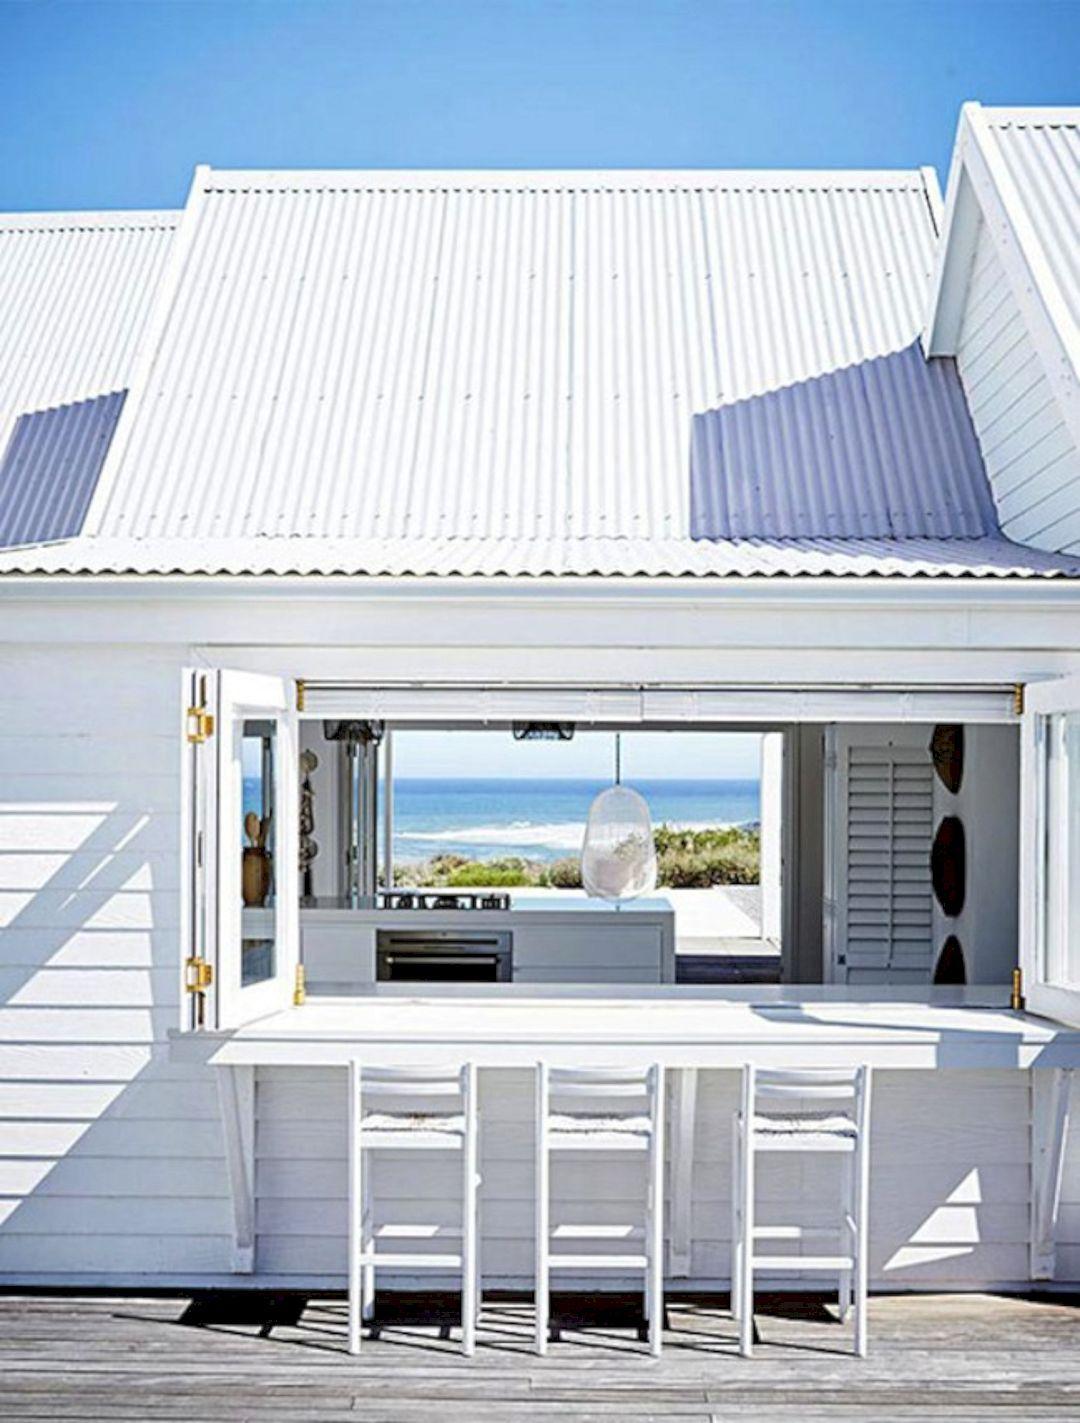 86 Amazing Modern Beach House Designs | House Design and Plan Ideas ...